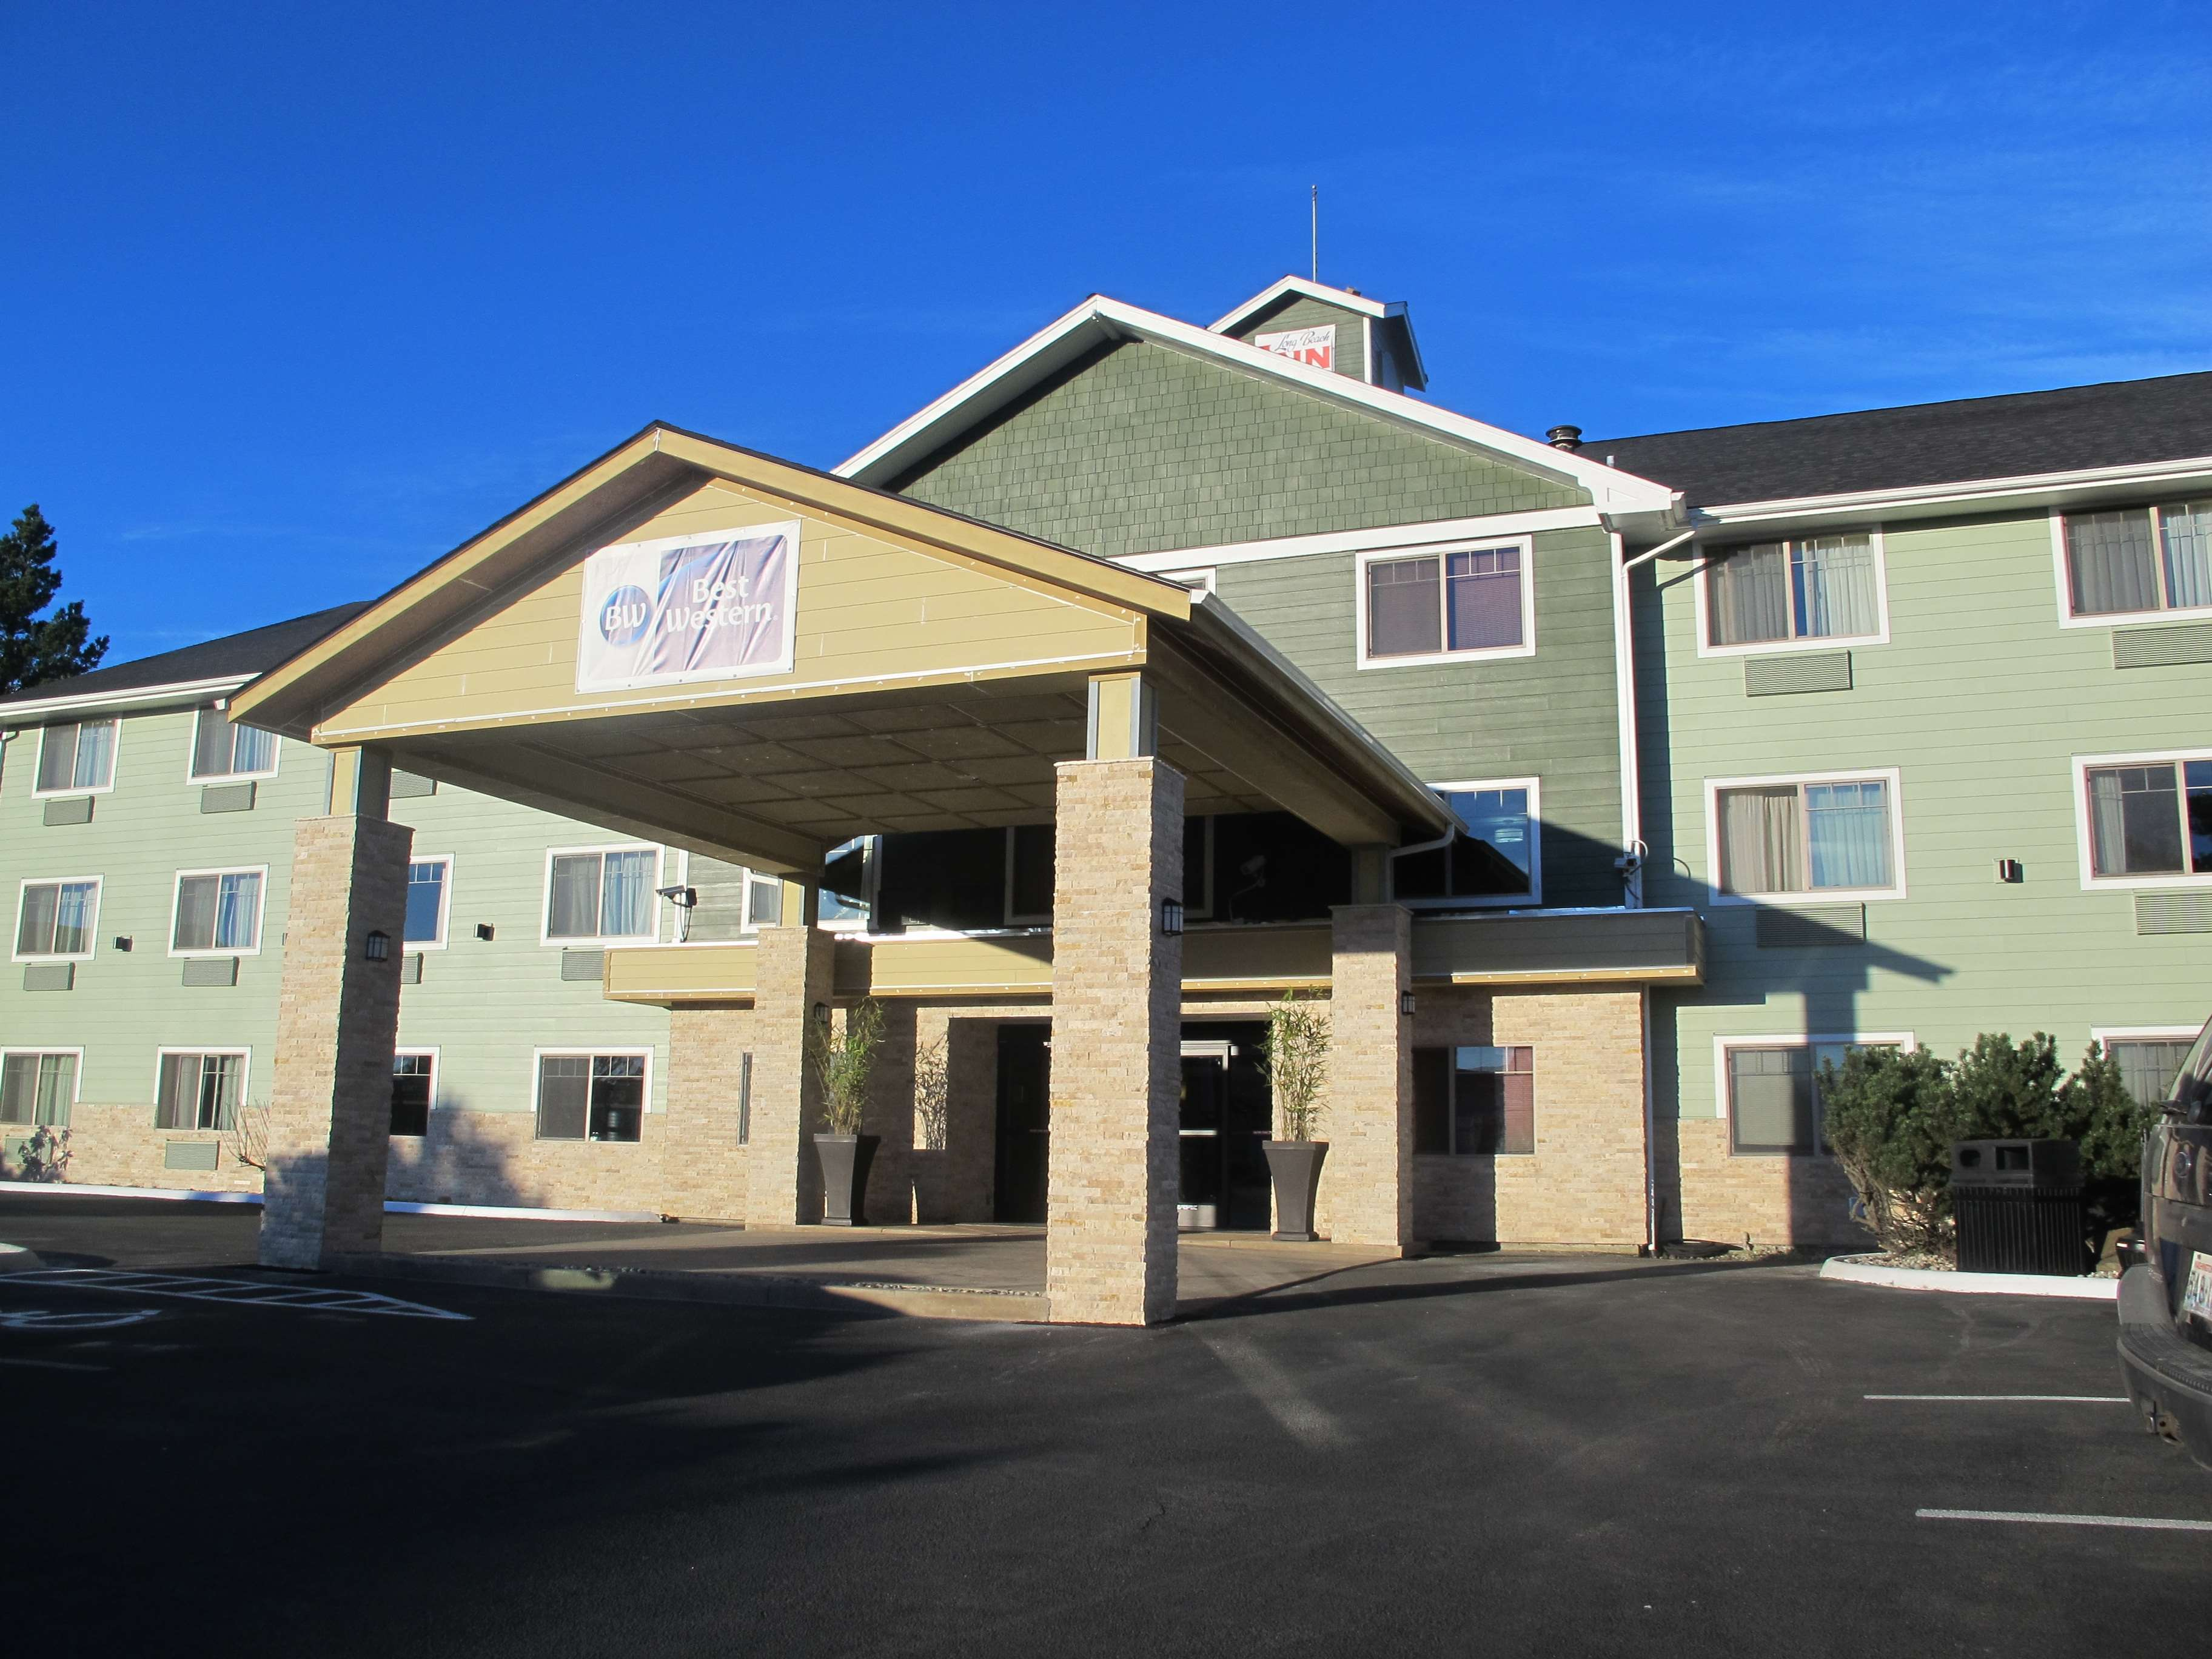 Hotels Motels In Long Beach Washington